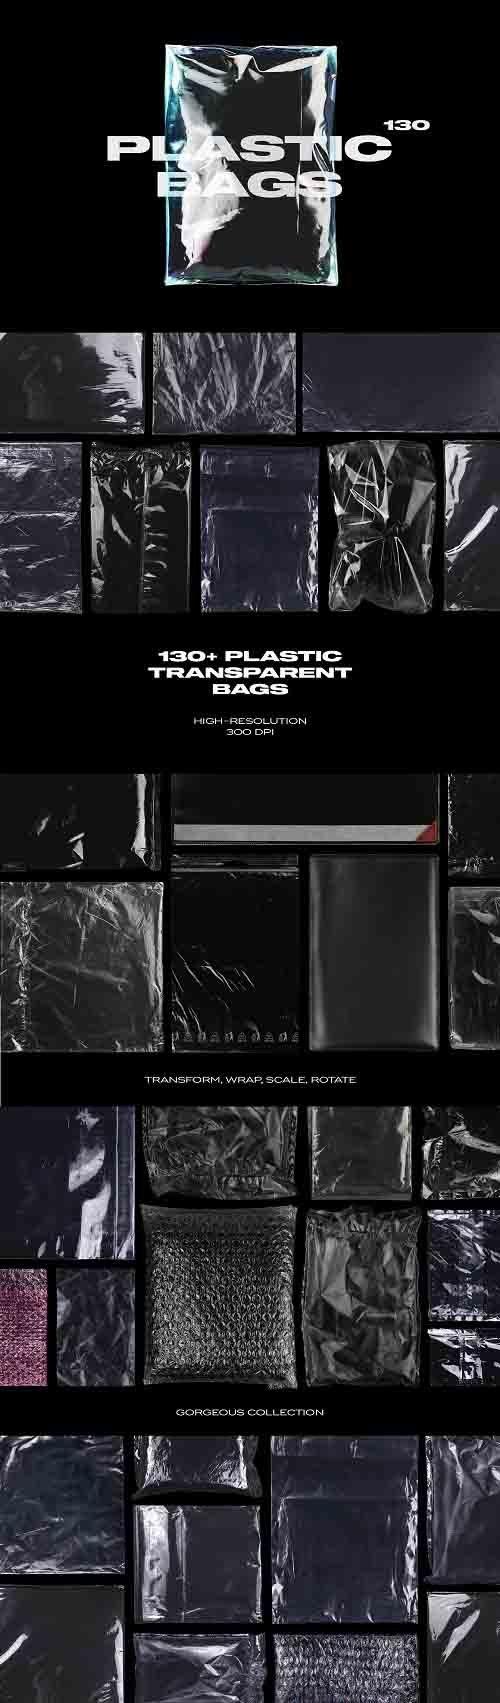 Plastic Bags Texture Branding Bundle - 5753364